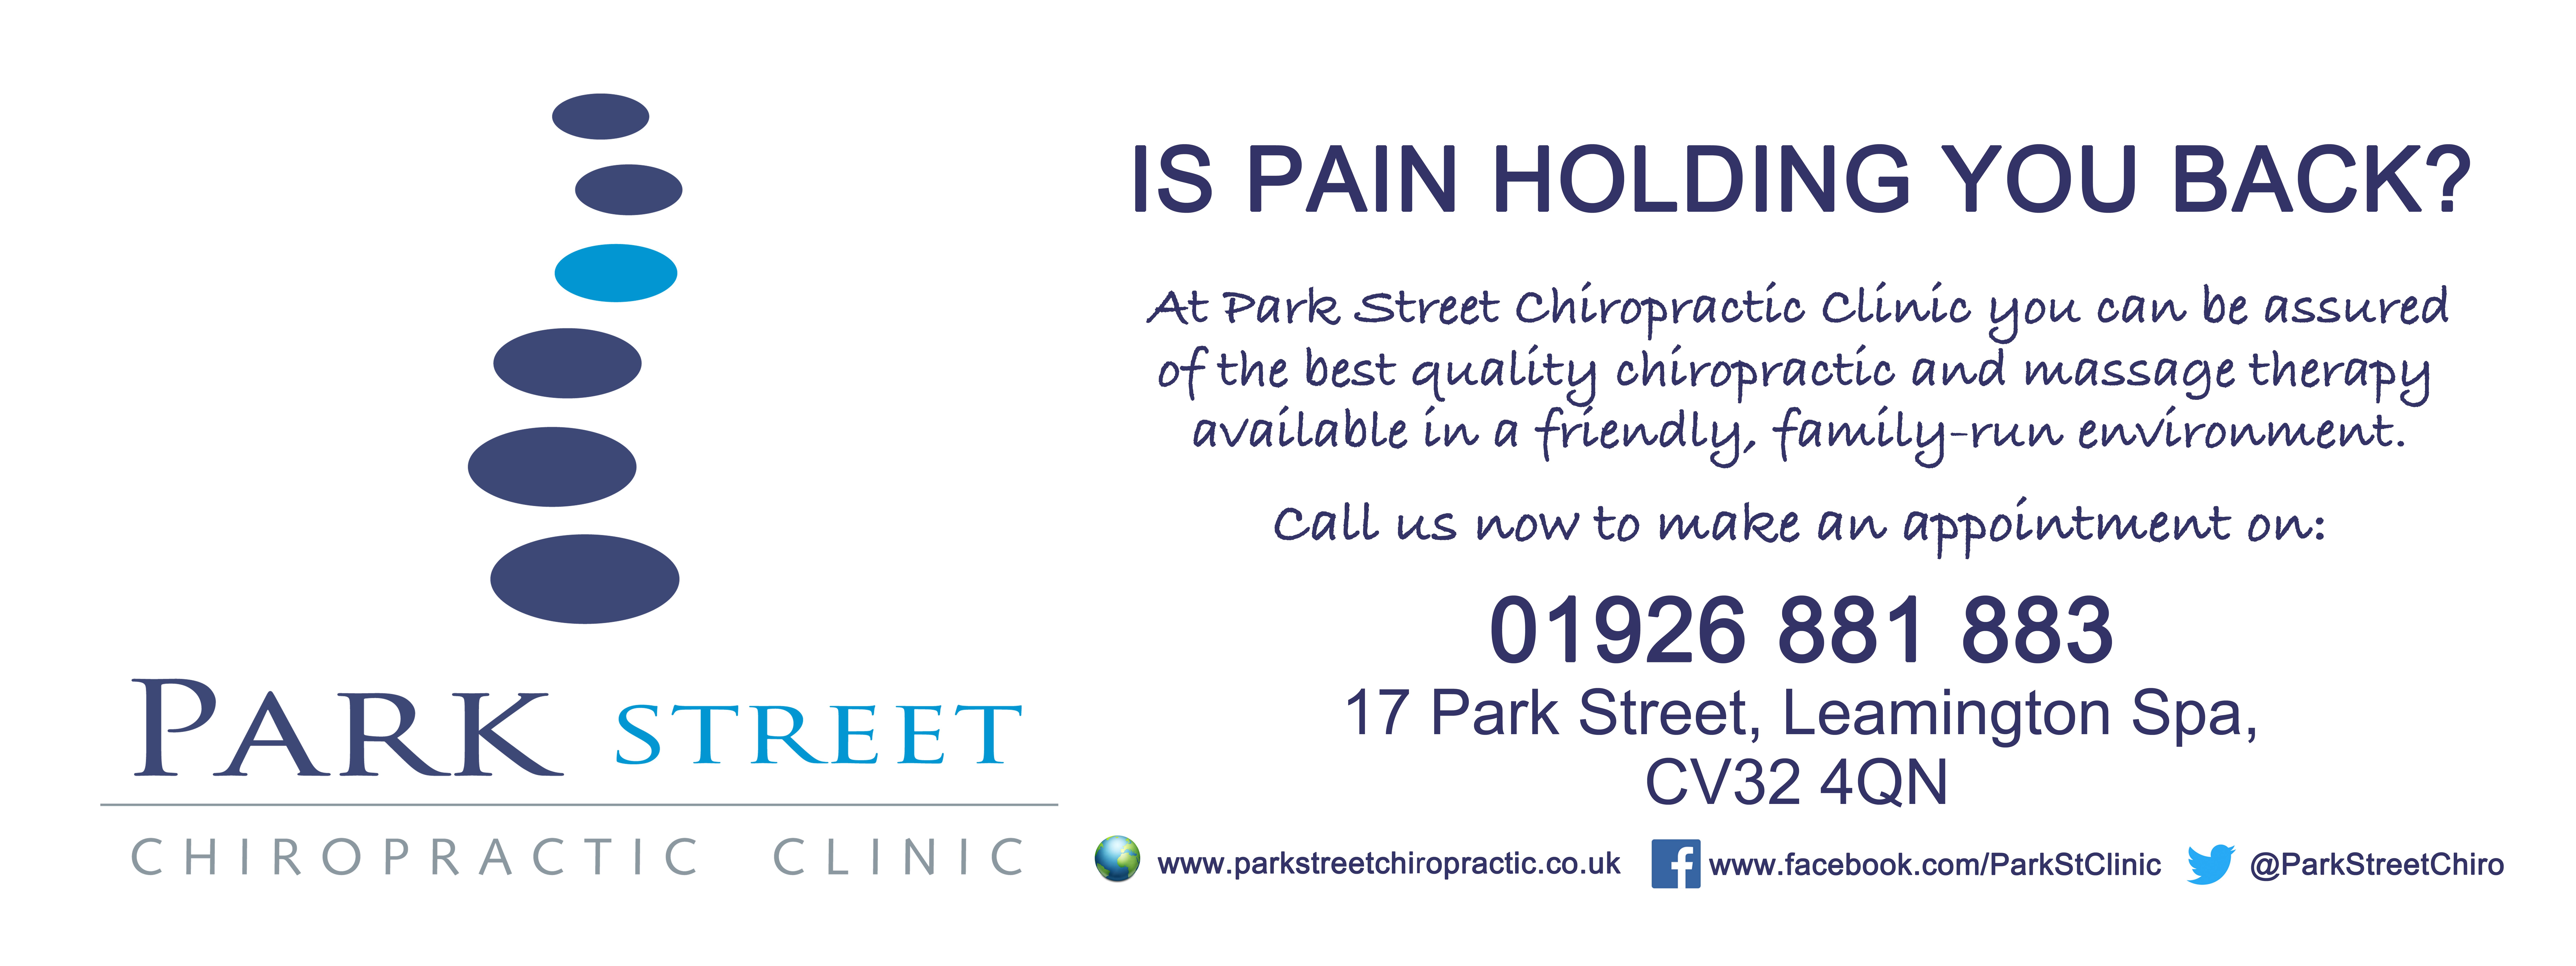 Park St Chiropractic